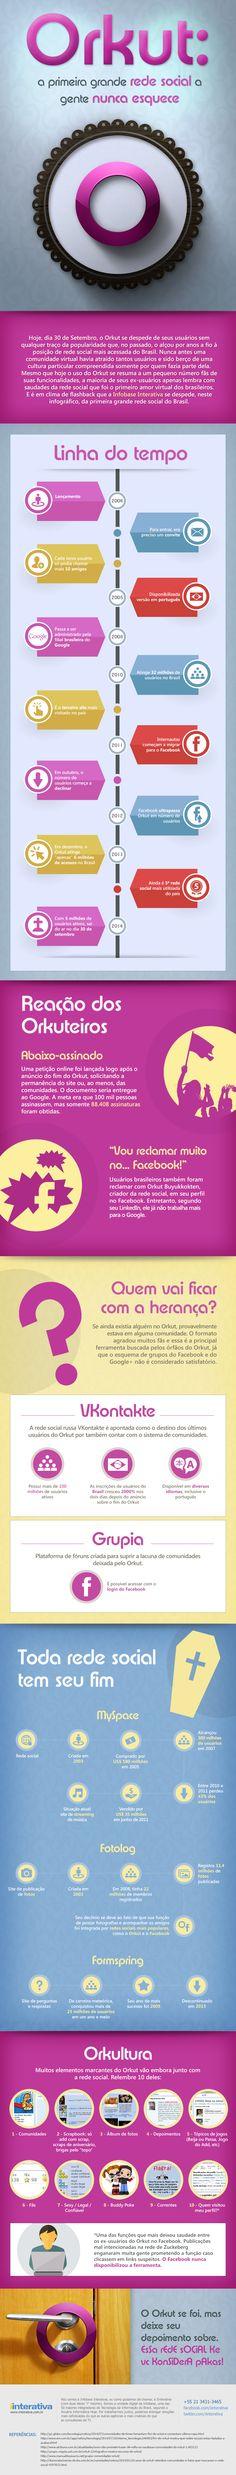 Infográfico do dia: Orkut — a primeira grande rede social a gente nunca esquece.